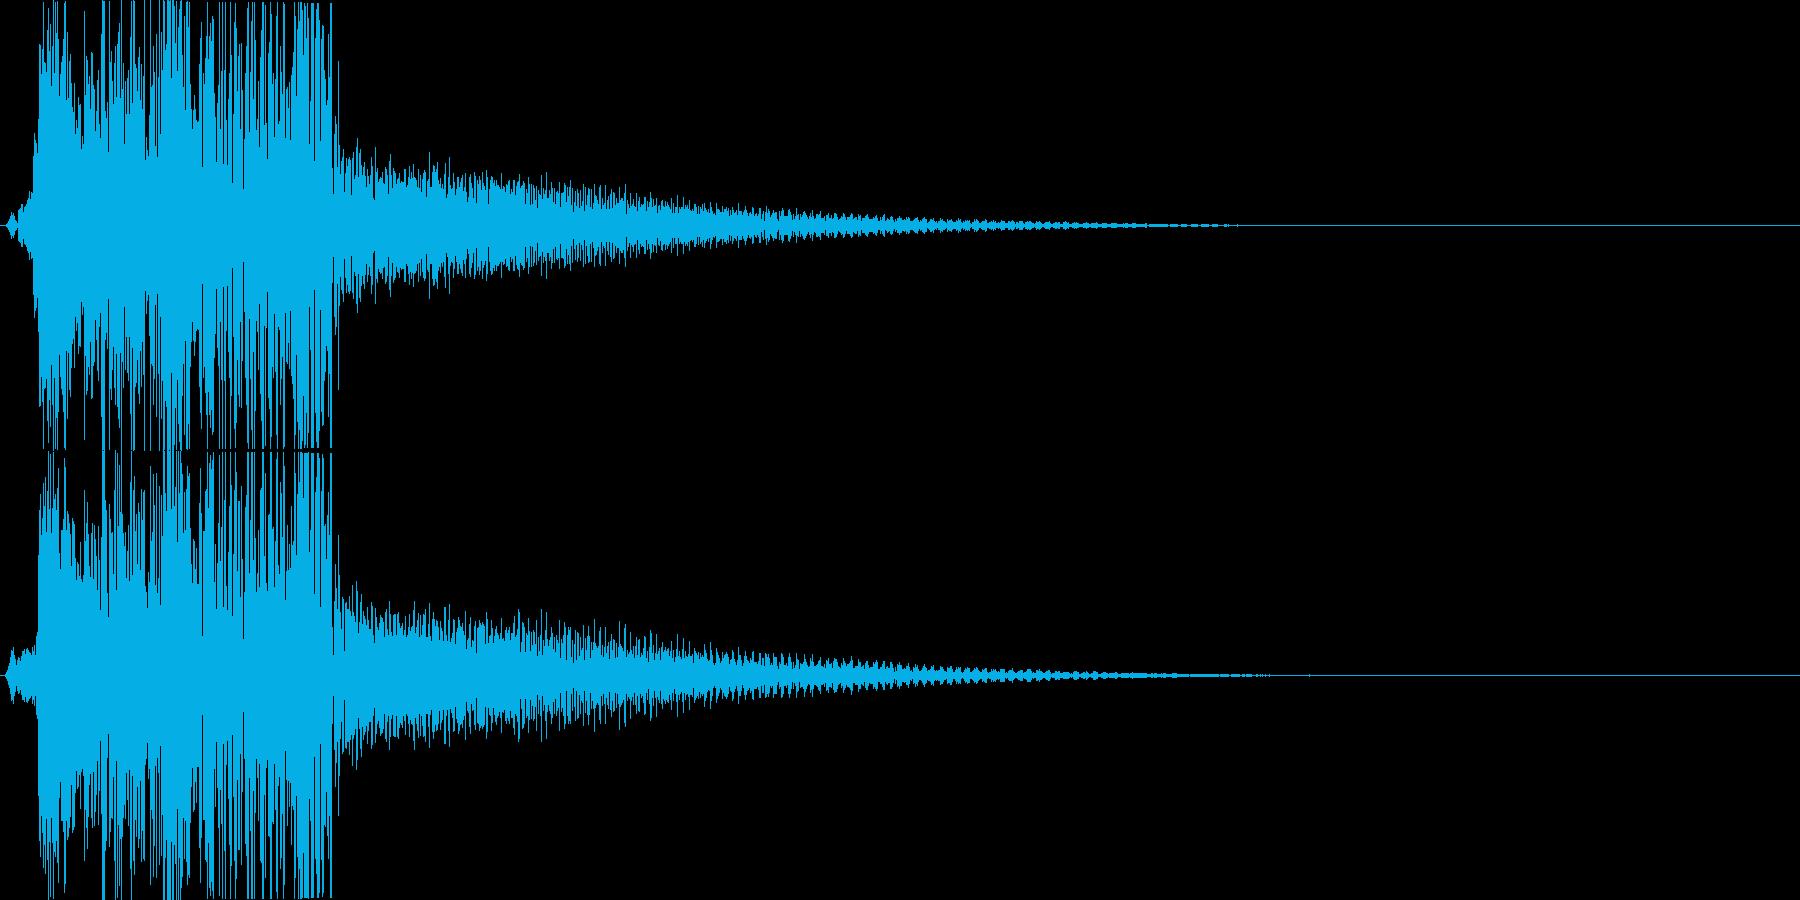 KANT 巨大ロボット系機械の足音4の再生済みの波形